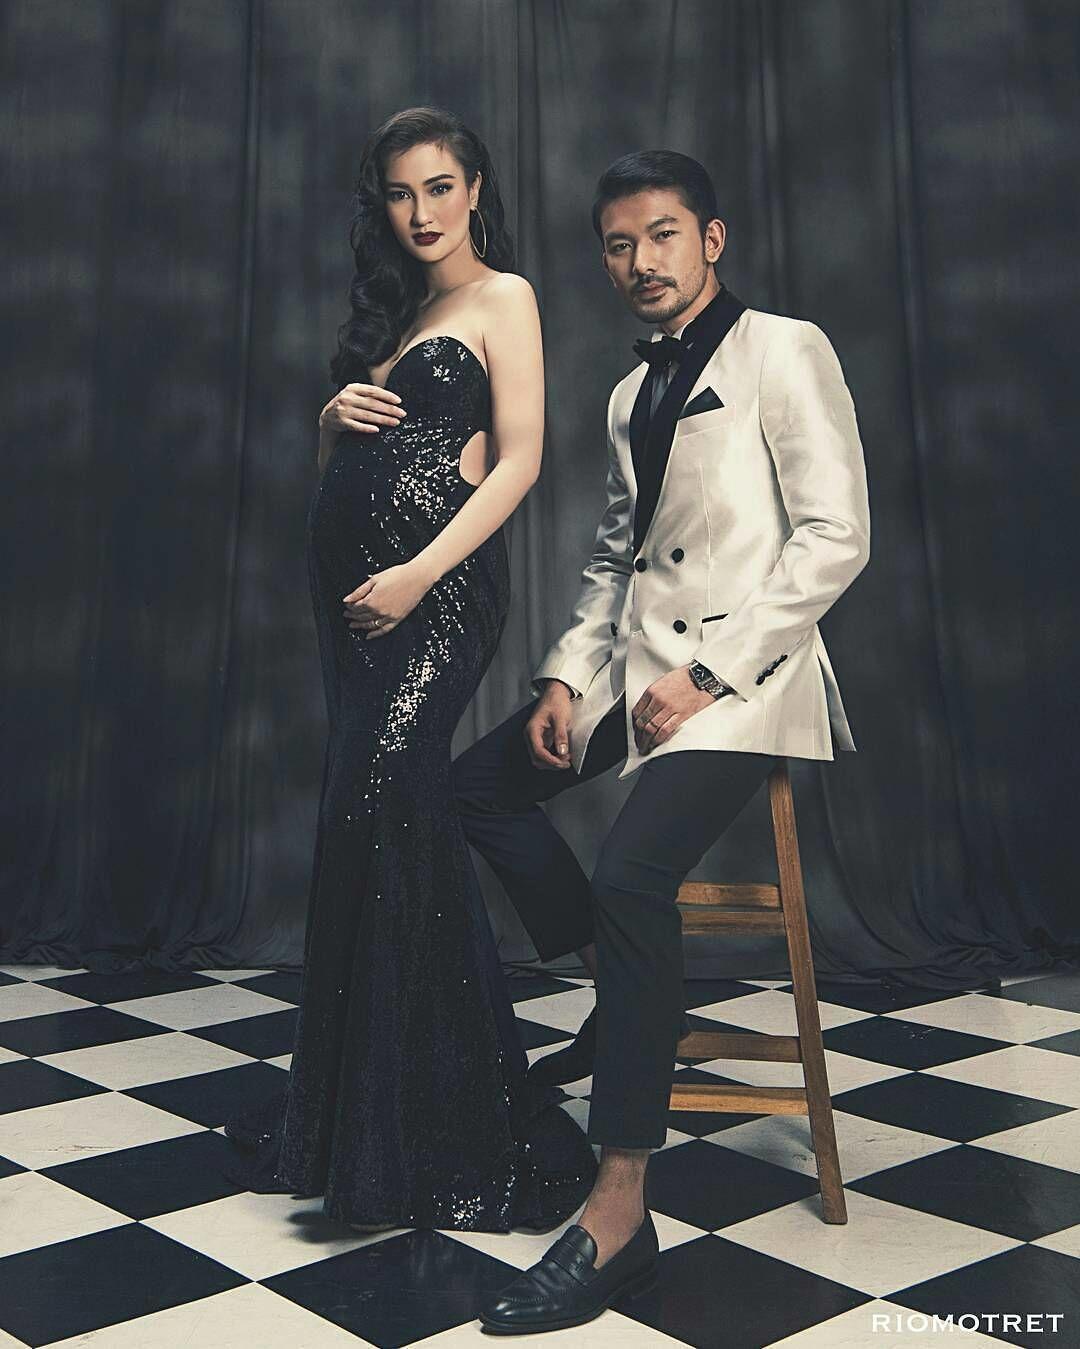 10 Maternity Shoot Paling Glamour dengan Gaun, Bak Bidadari Kayangan!